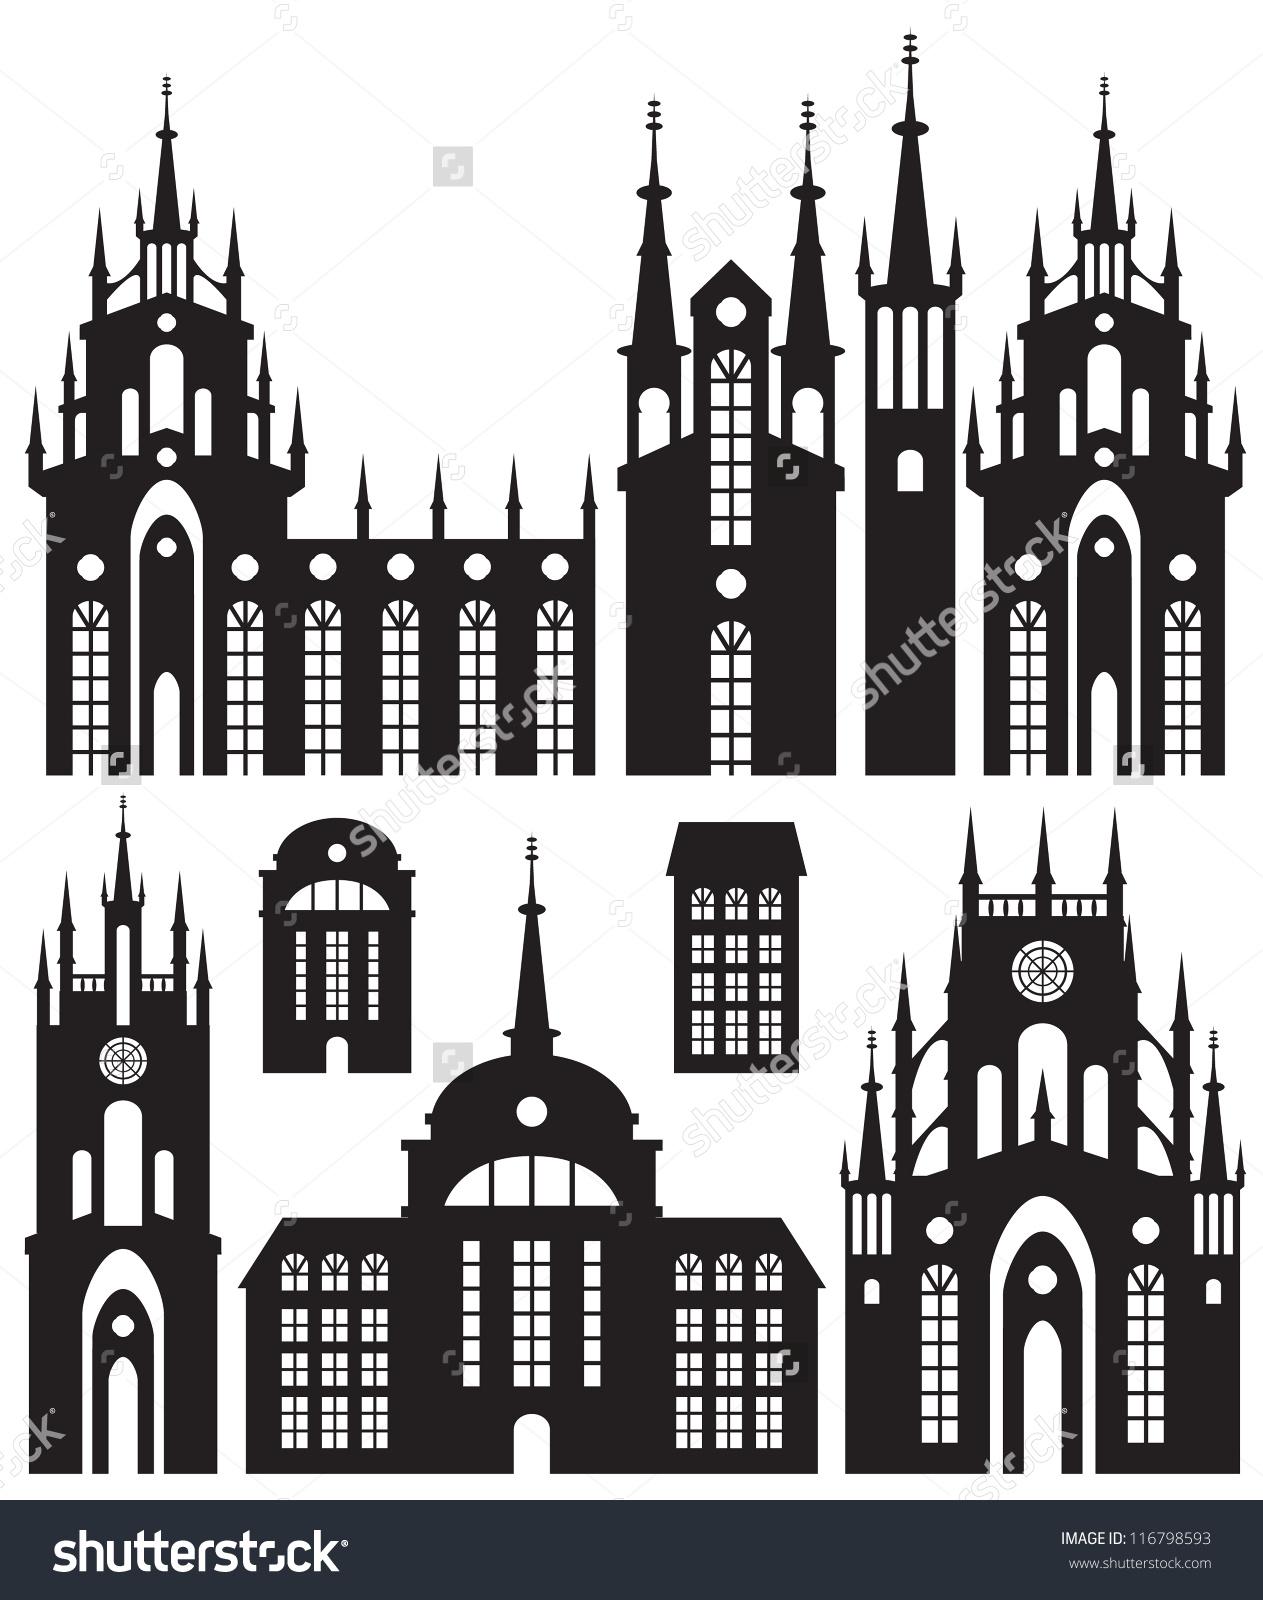 Set Silhouettes Buildings Castles Churches Stock Vector 116798593.